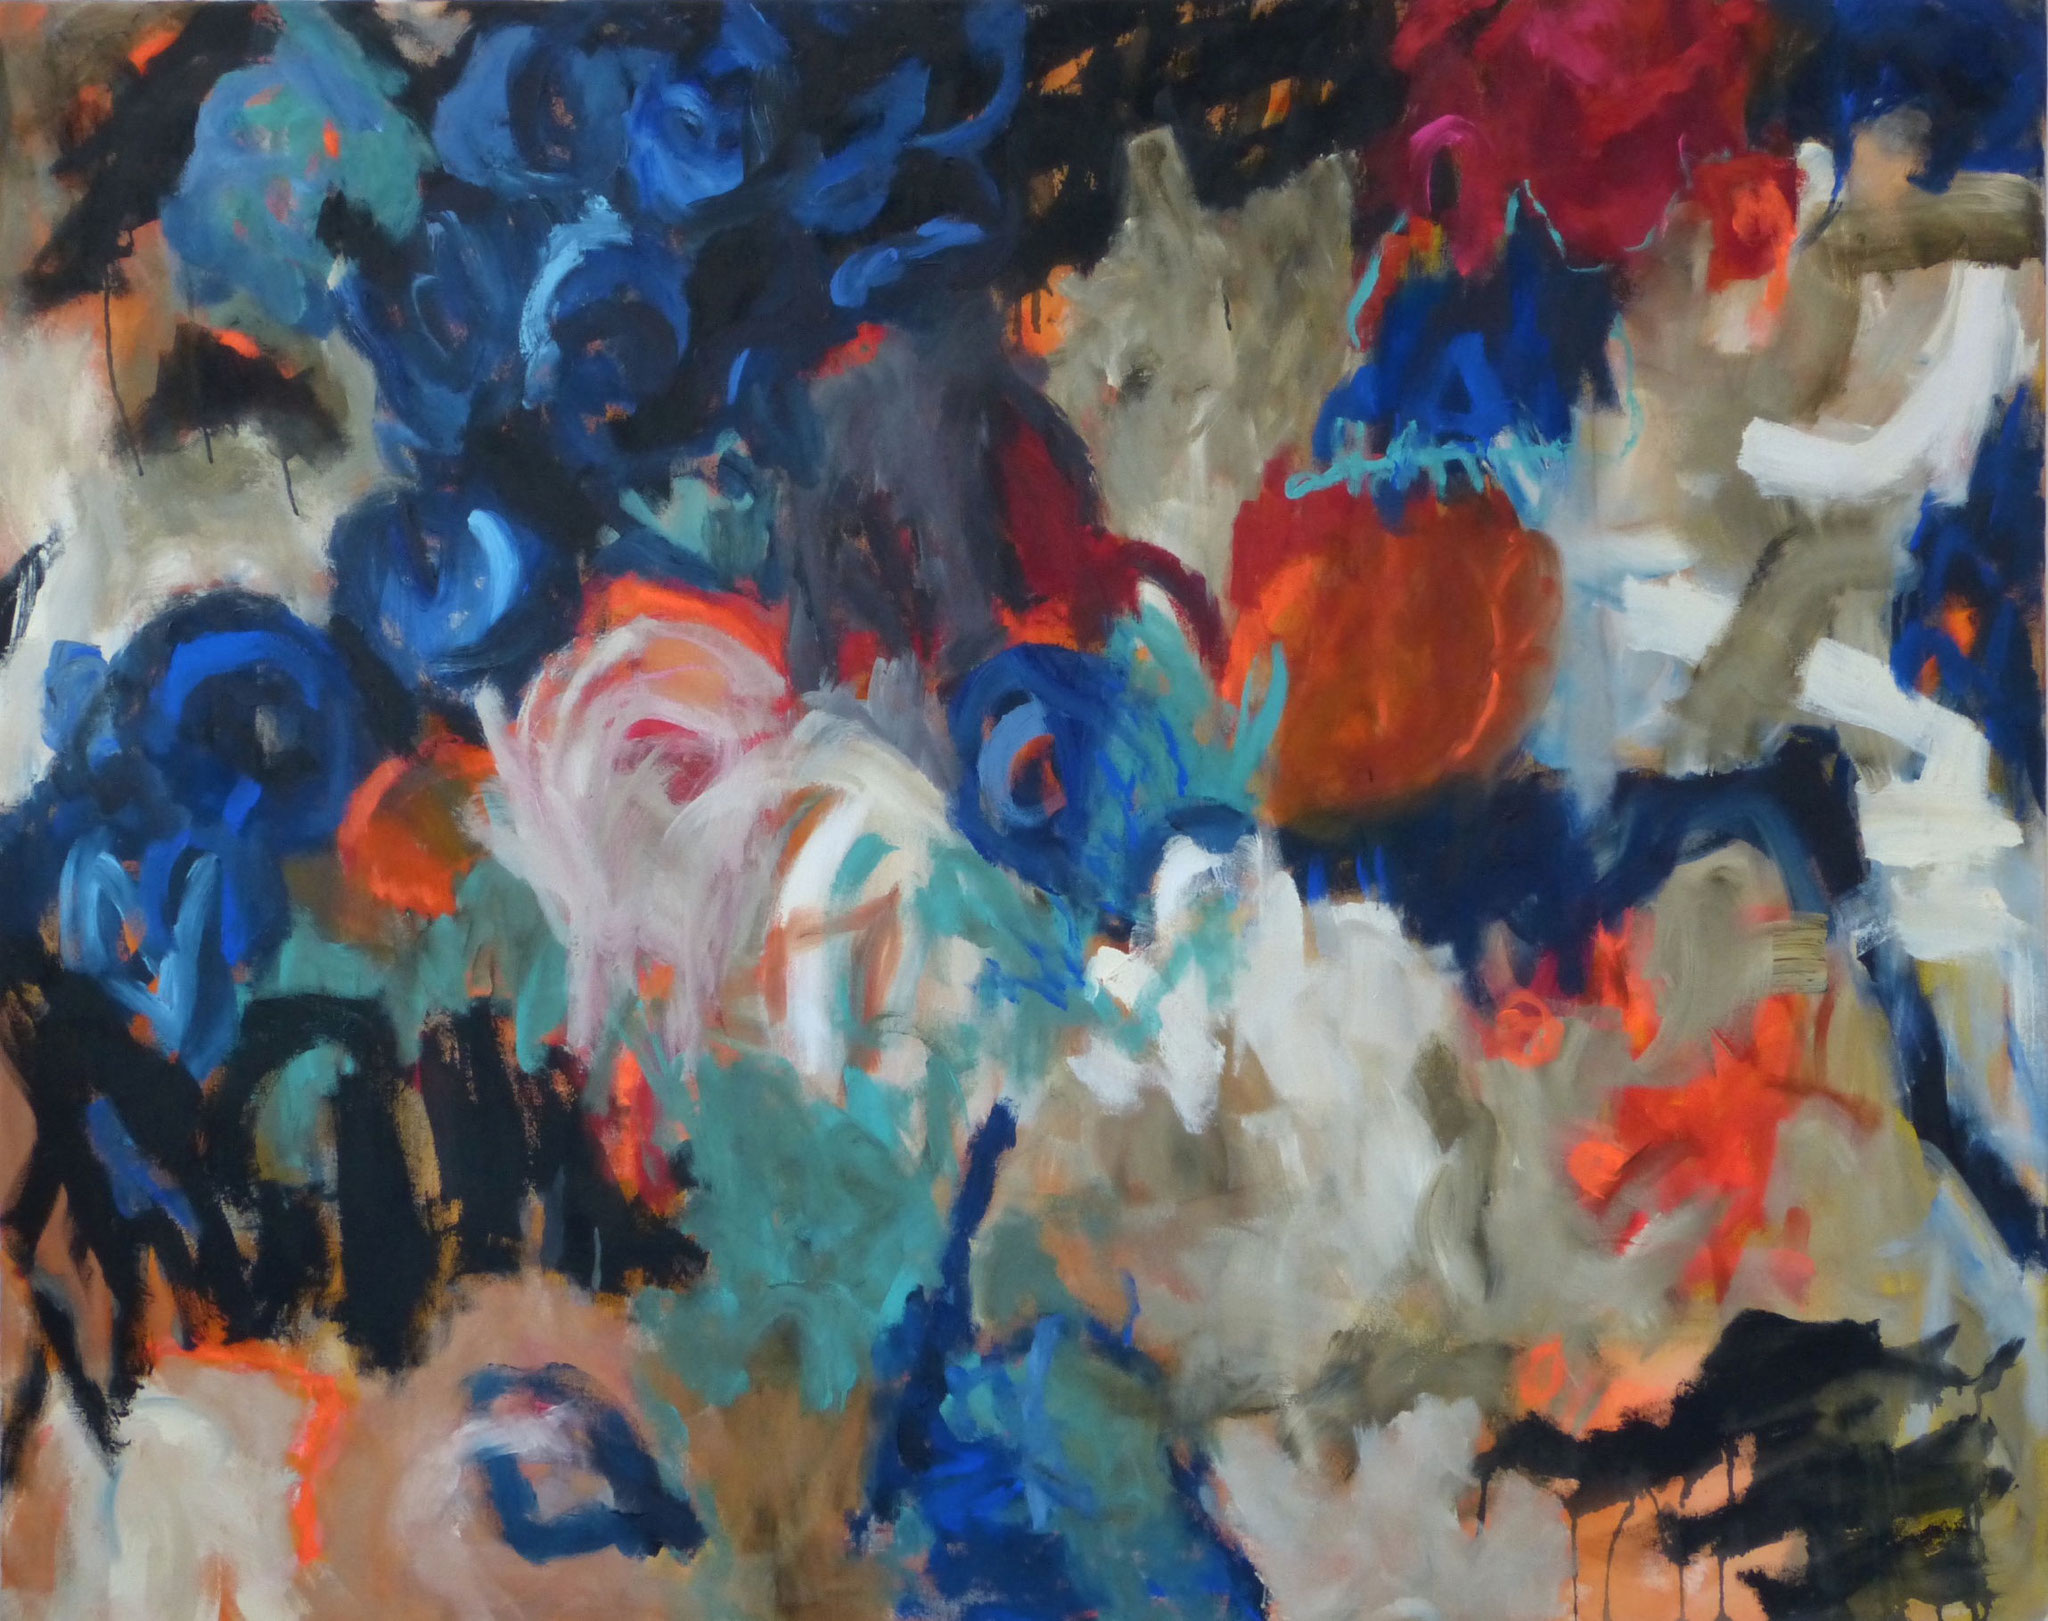 Furioso, Acryl auf Leinwand, 120x150cm, 2018